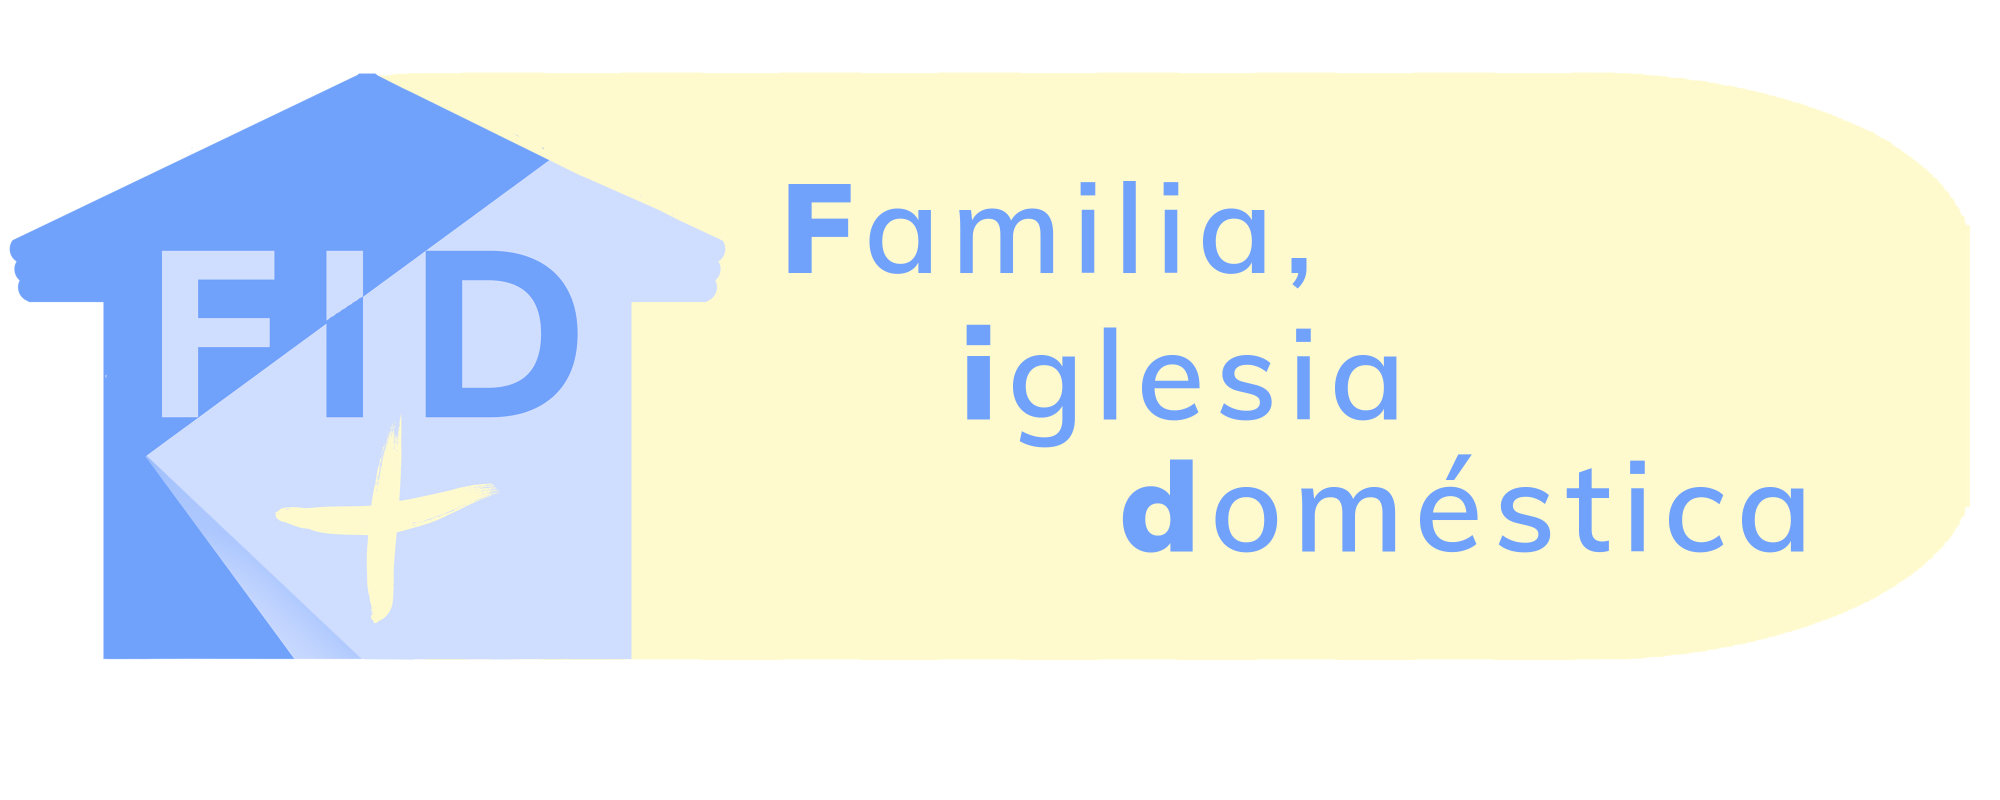 Familia, iglesia doméstica